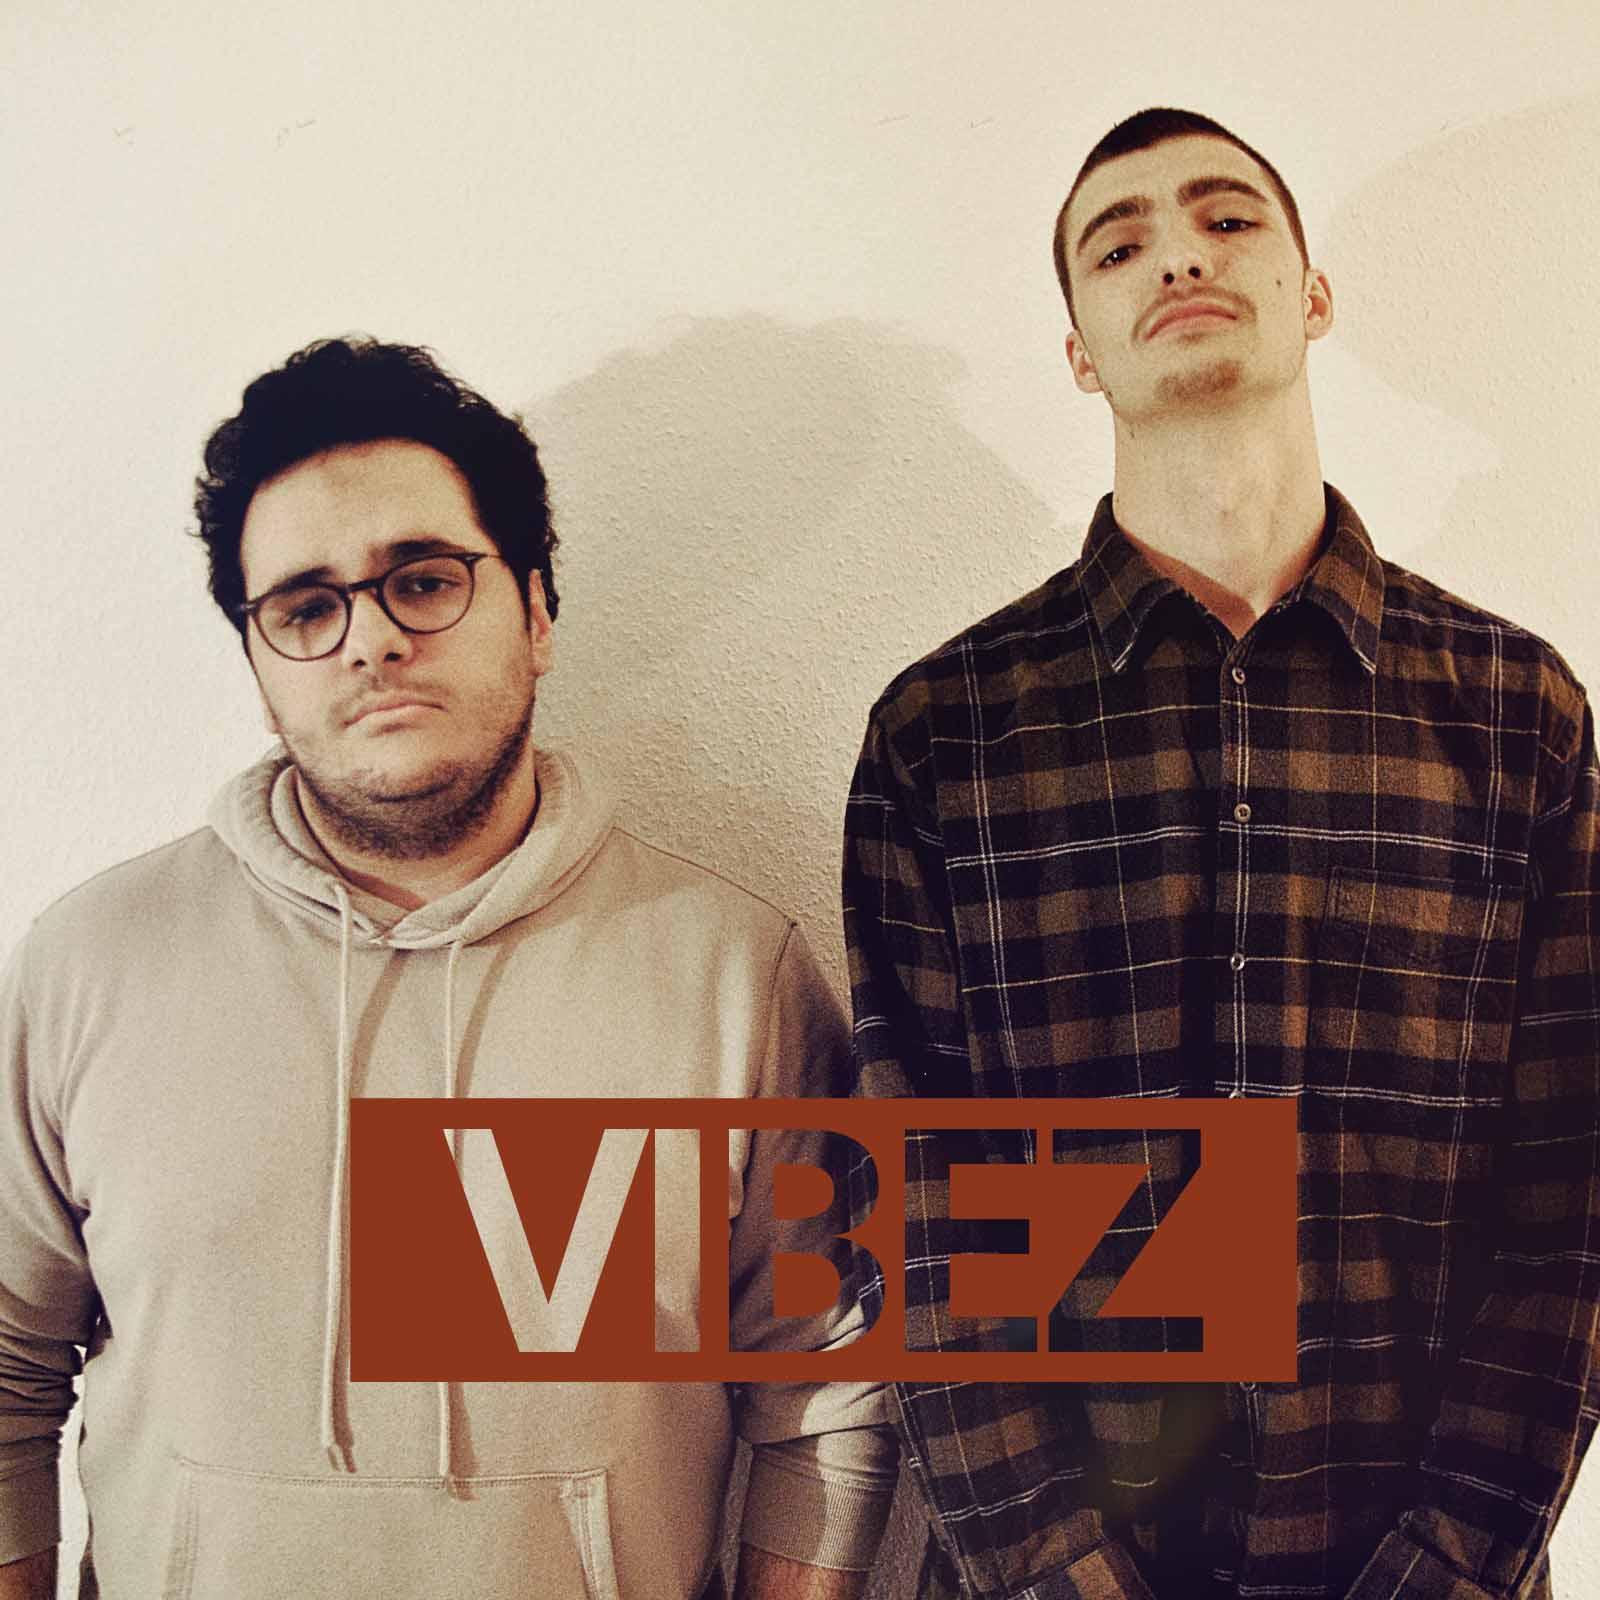 Upcoming: Jaaas x Lassal - VIBEZ (MUSIKVIDEO)